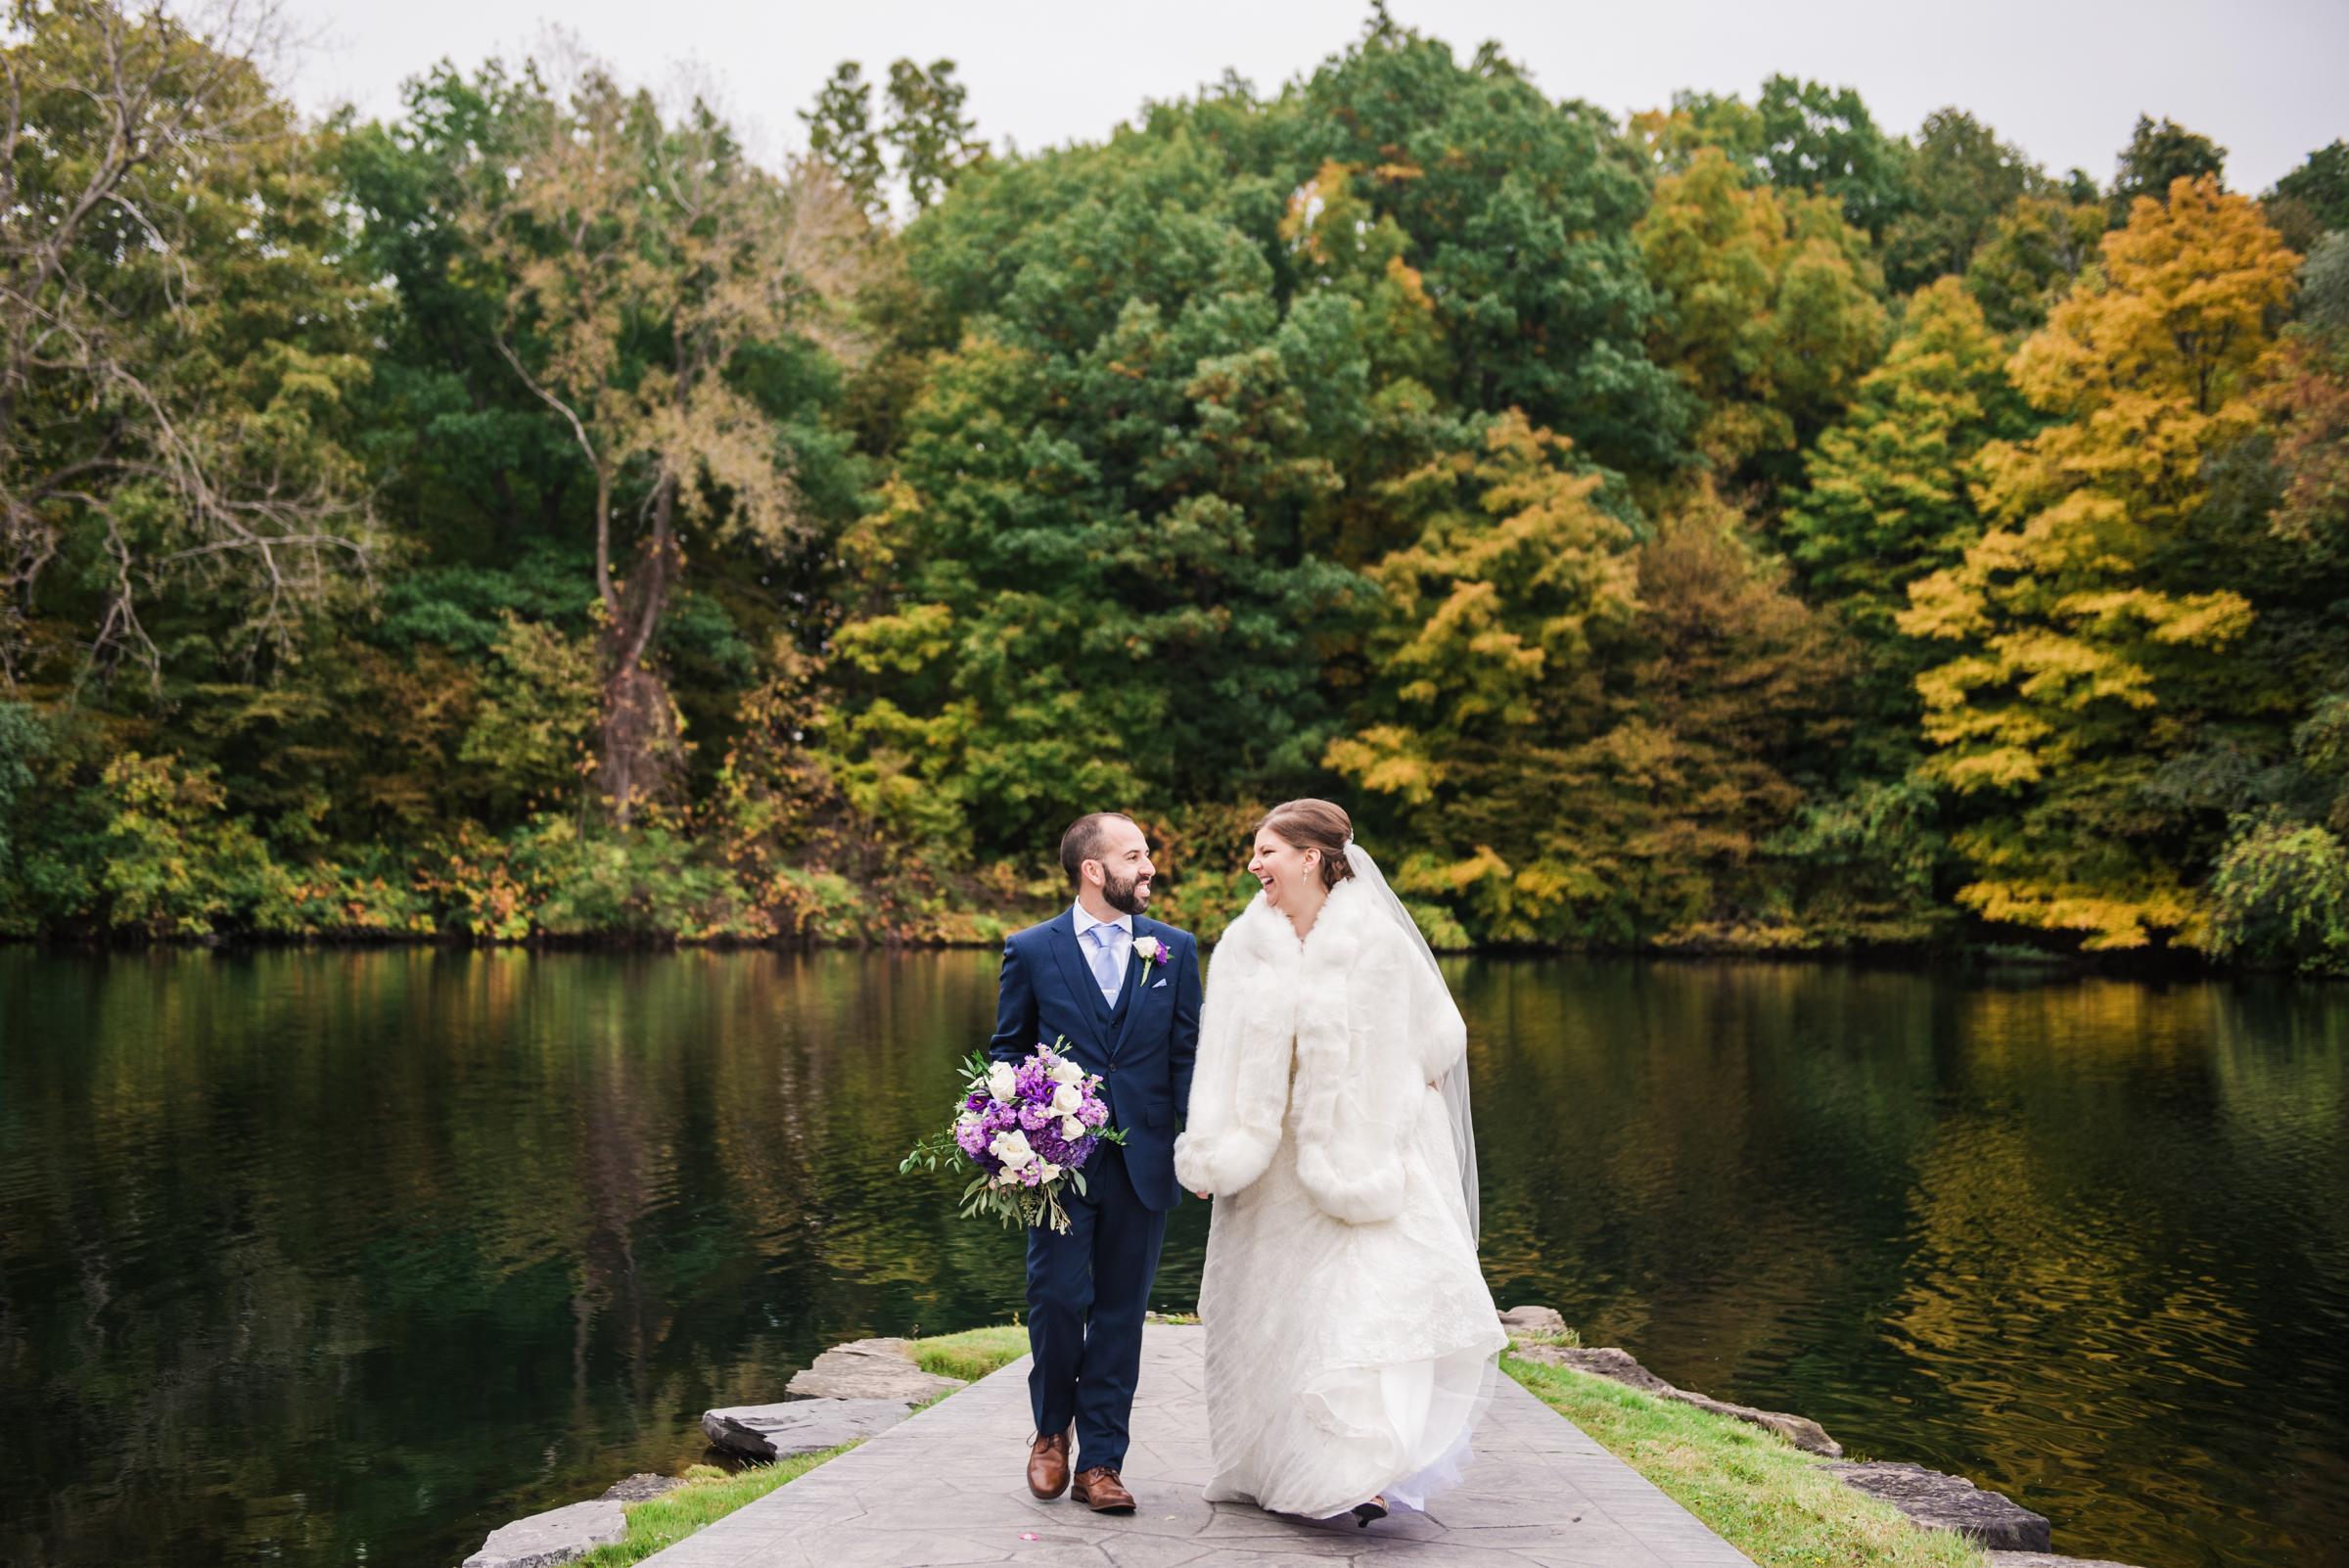 Shadow_Lake_Rochester_Wedding_JILL_STUDIO_Rochester_NY_Photographer_DSC_6037.jpg